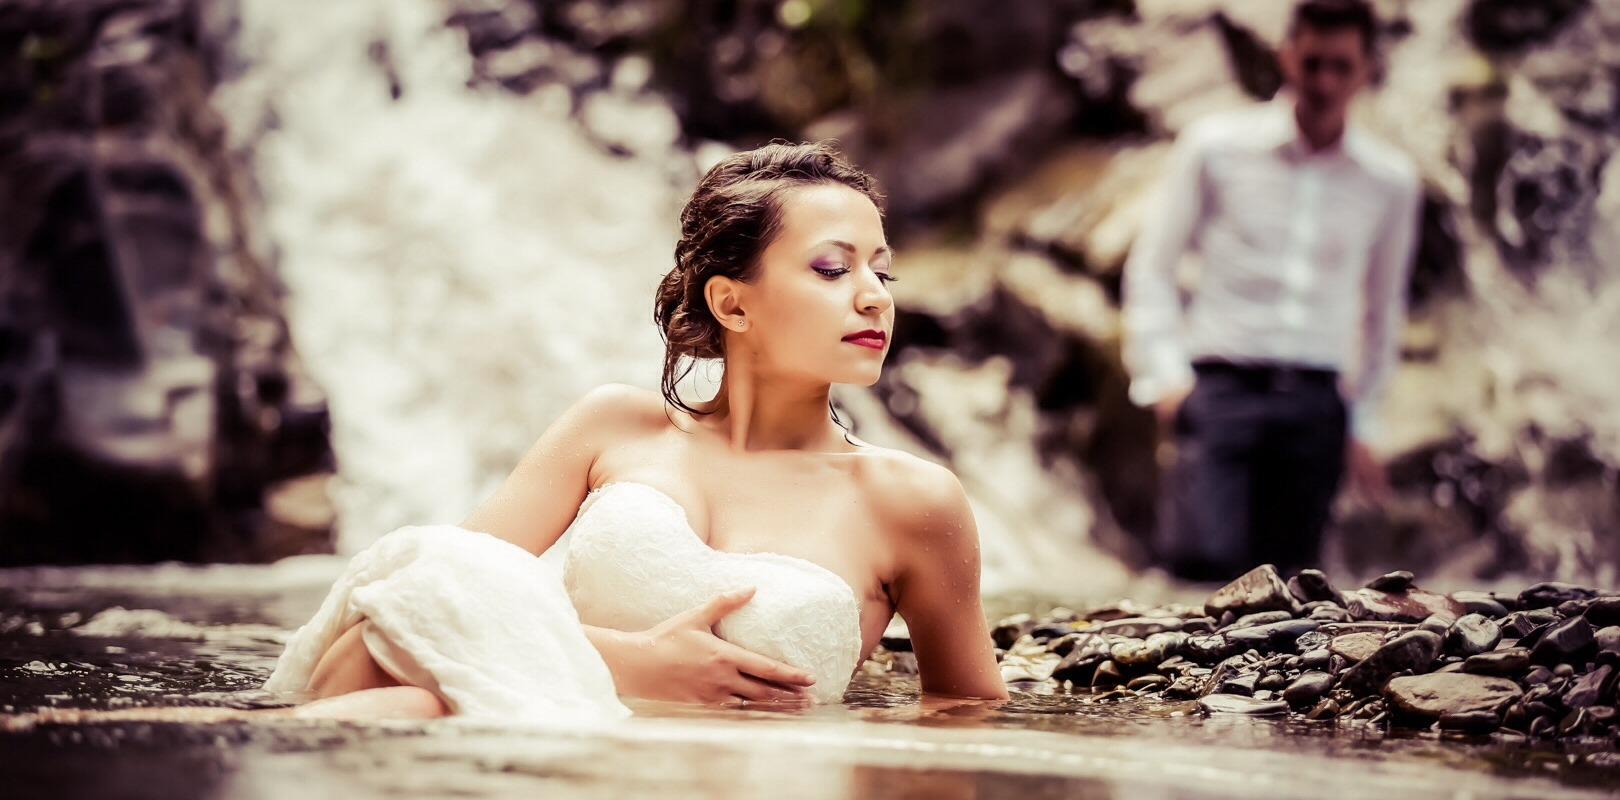 fotograf nunta - Cristi Timofte